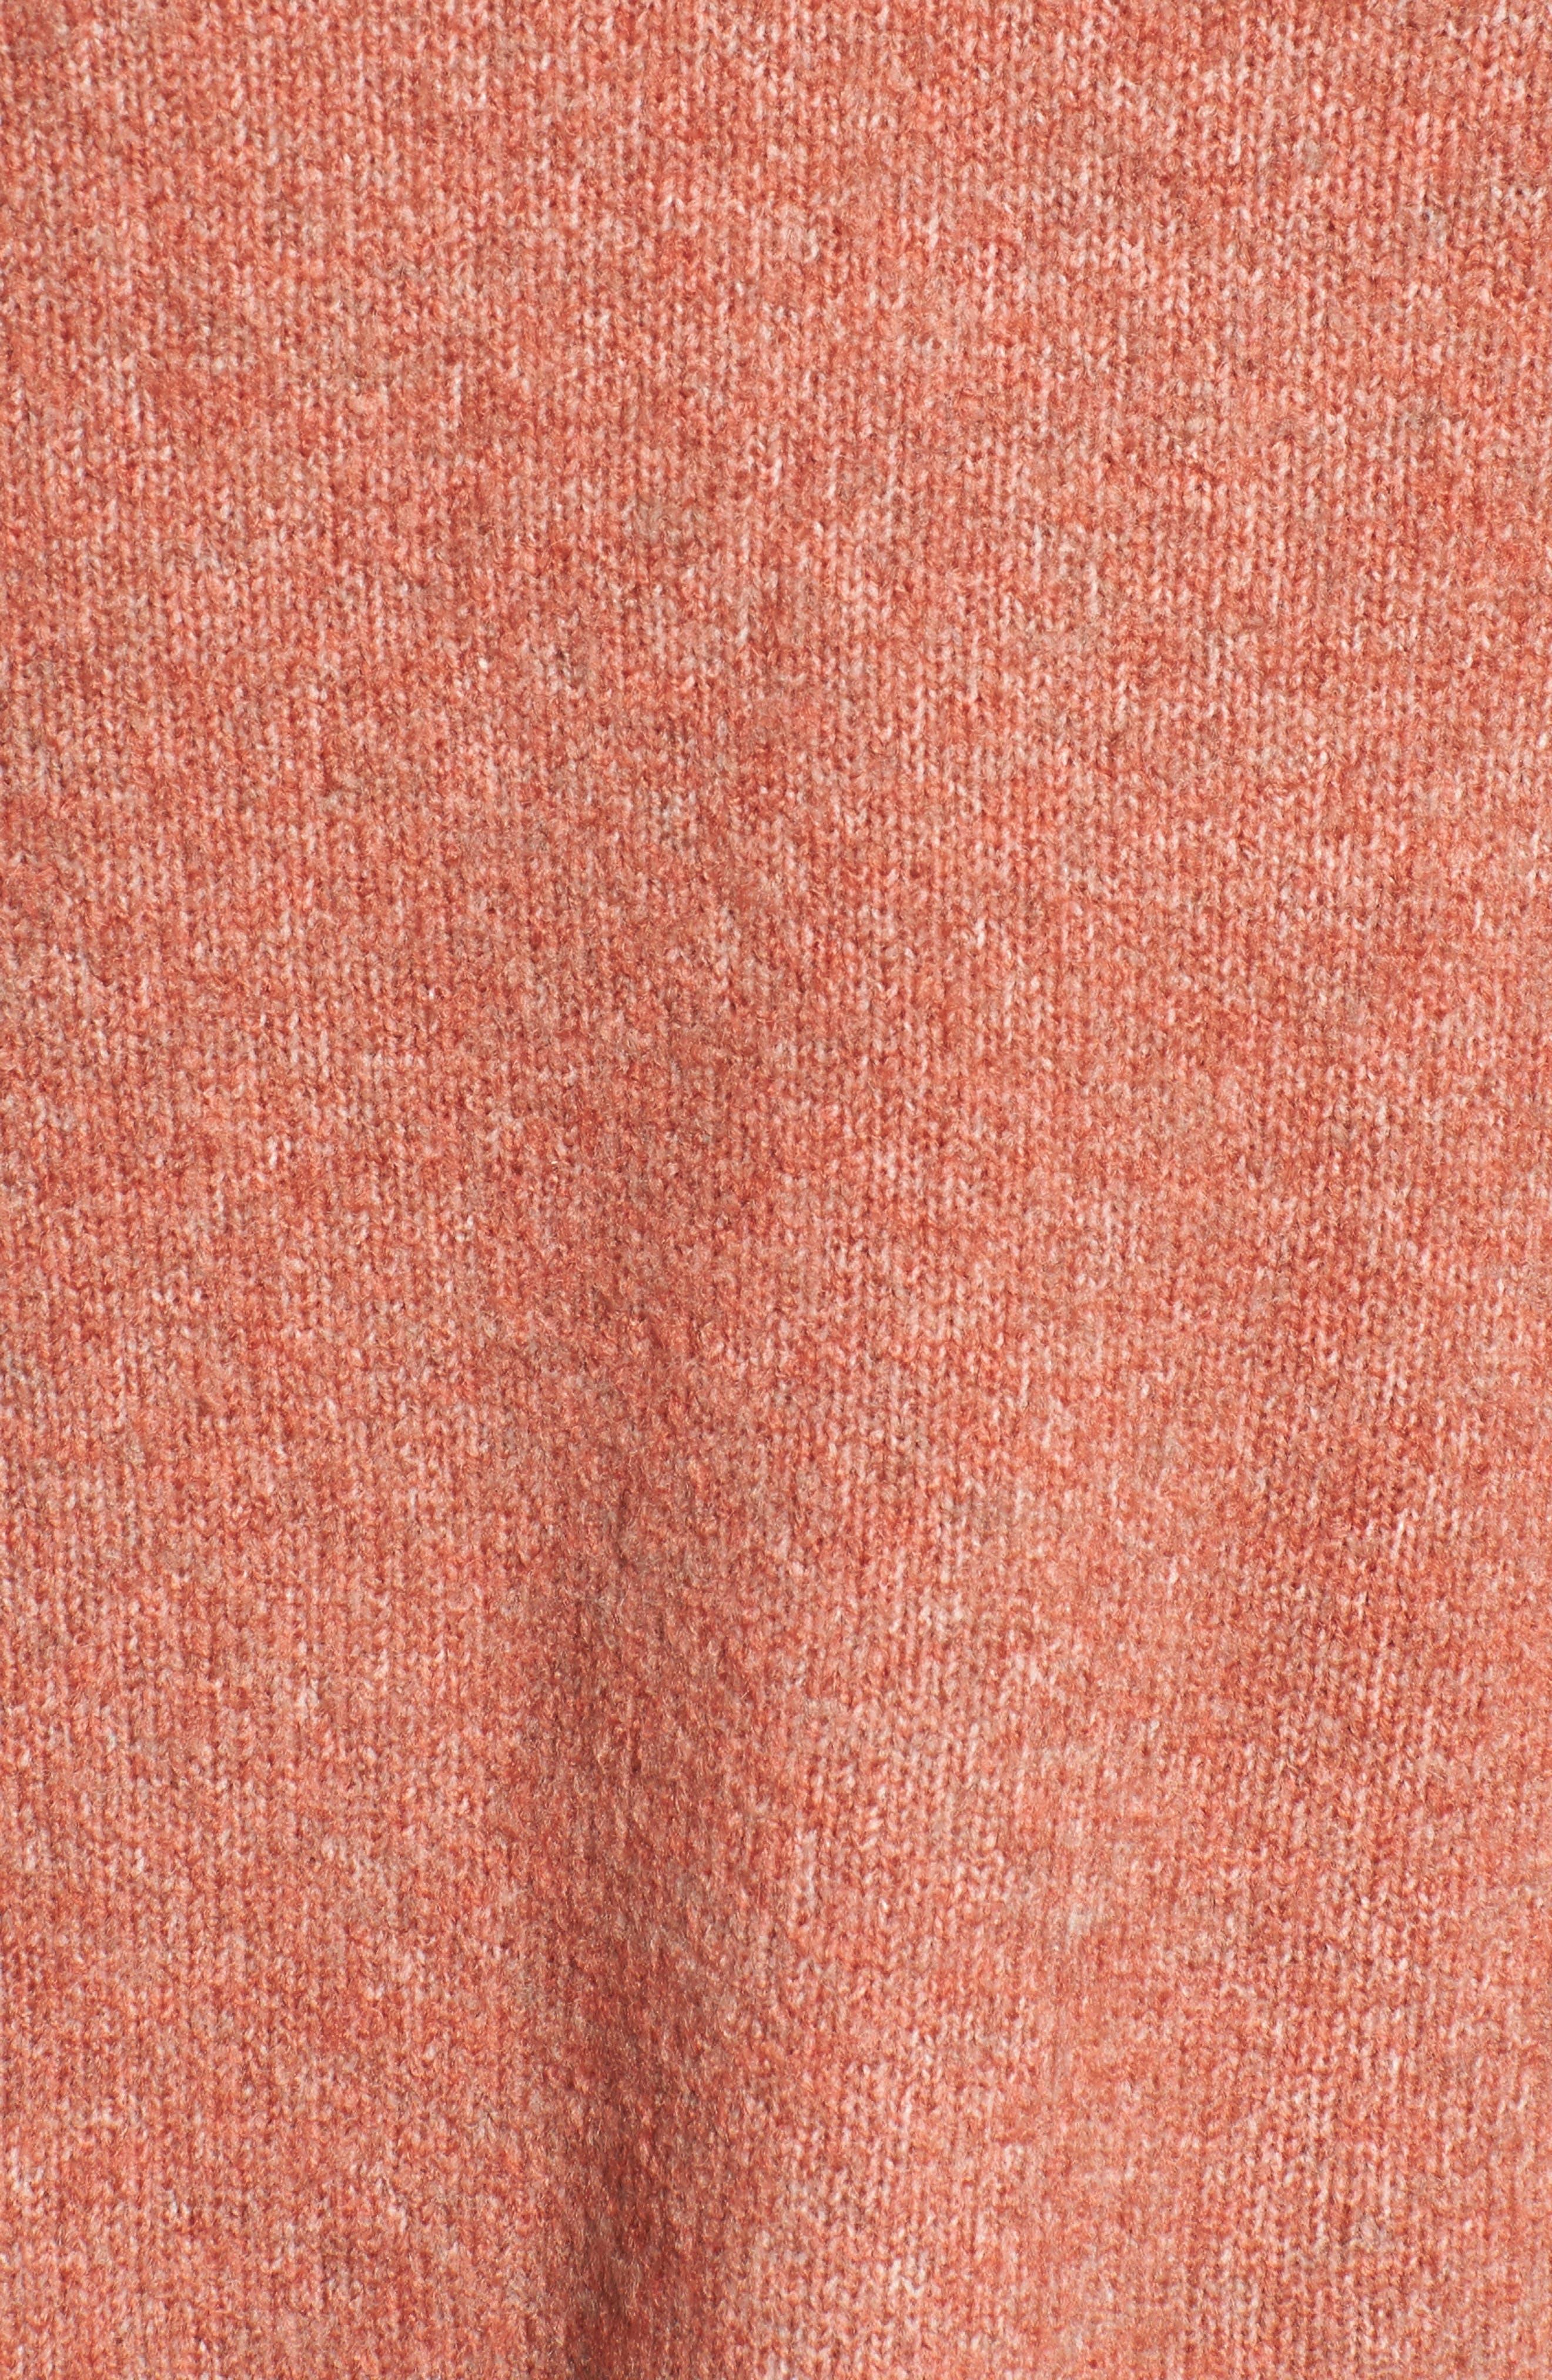 Bell Sleeve Sweater,                             Alternate thumbnail 4, color,                             Coral Rose Tea Rainbow Multi